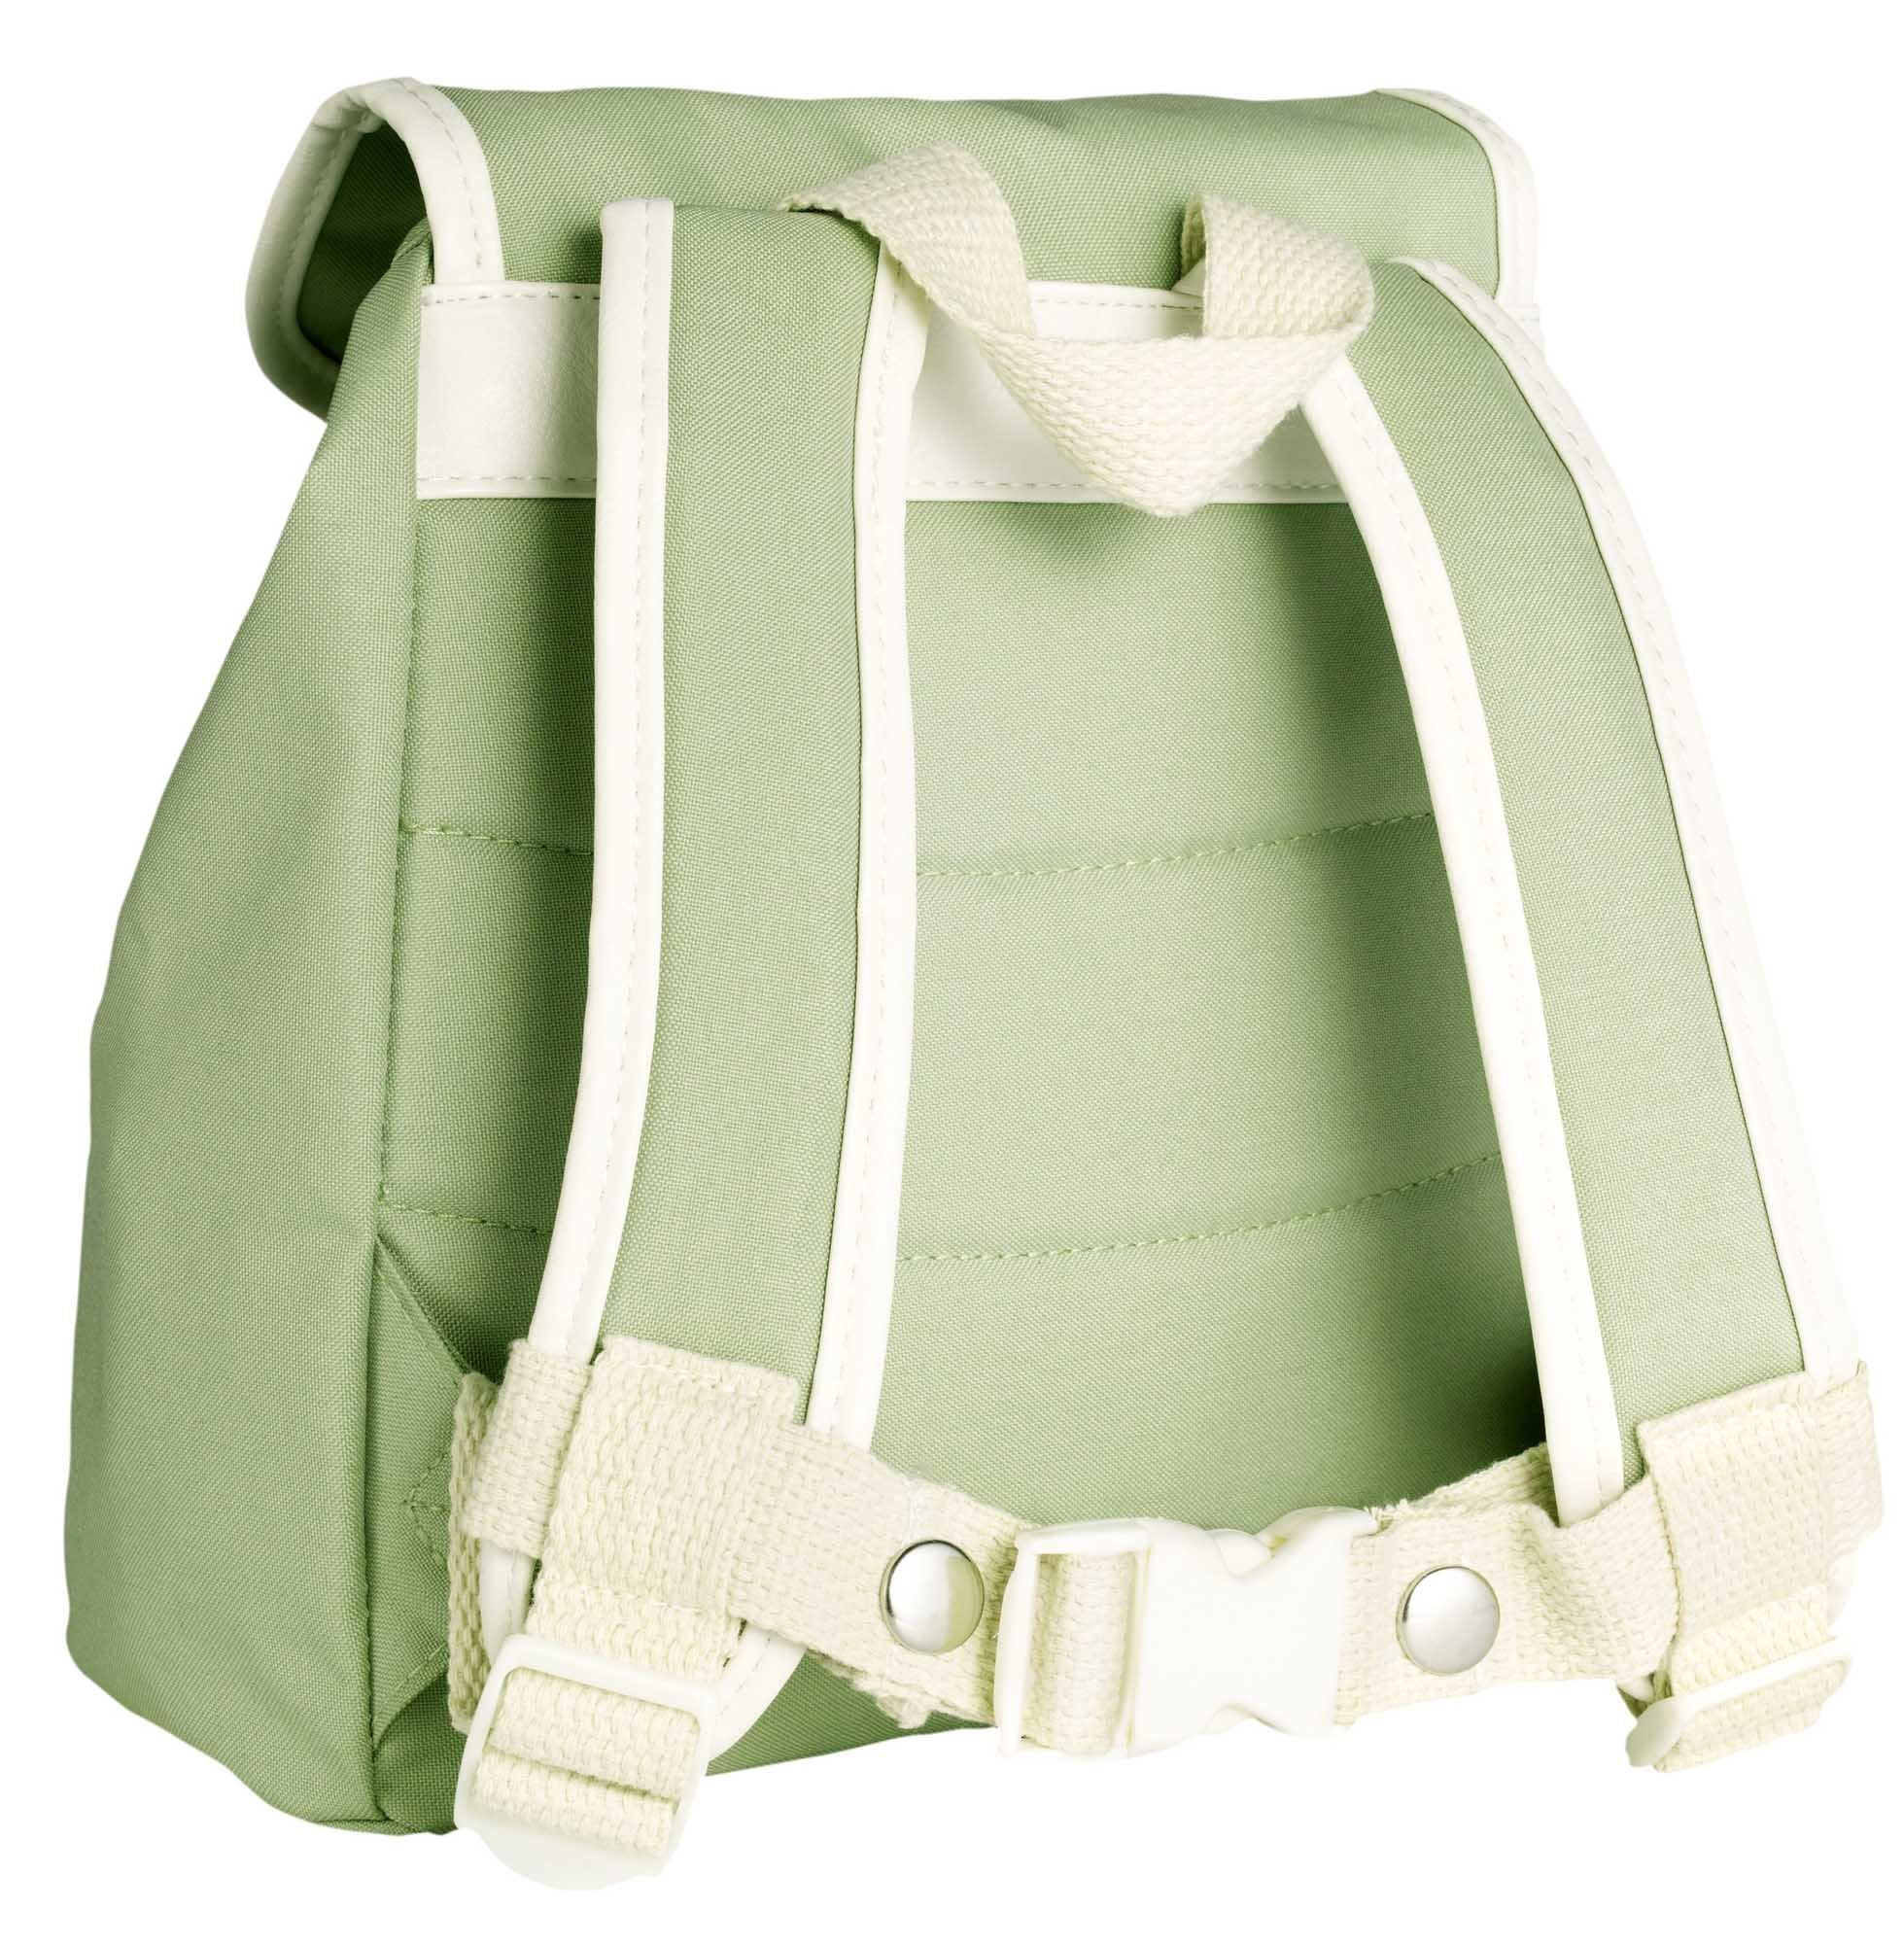 BLAFRE Ryggsäck Grön